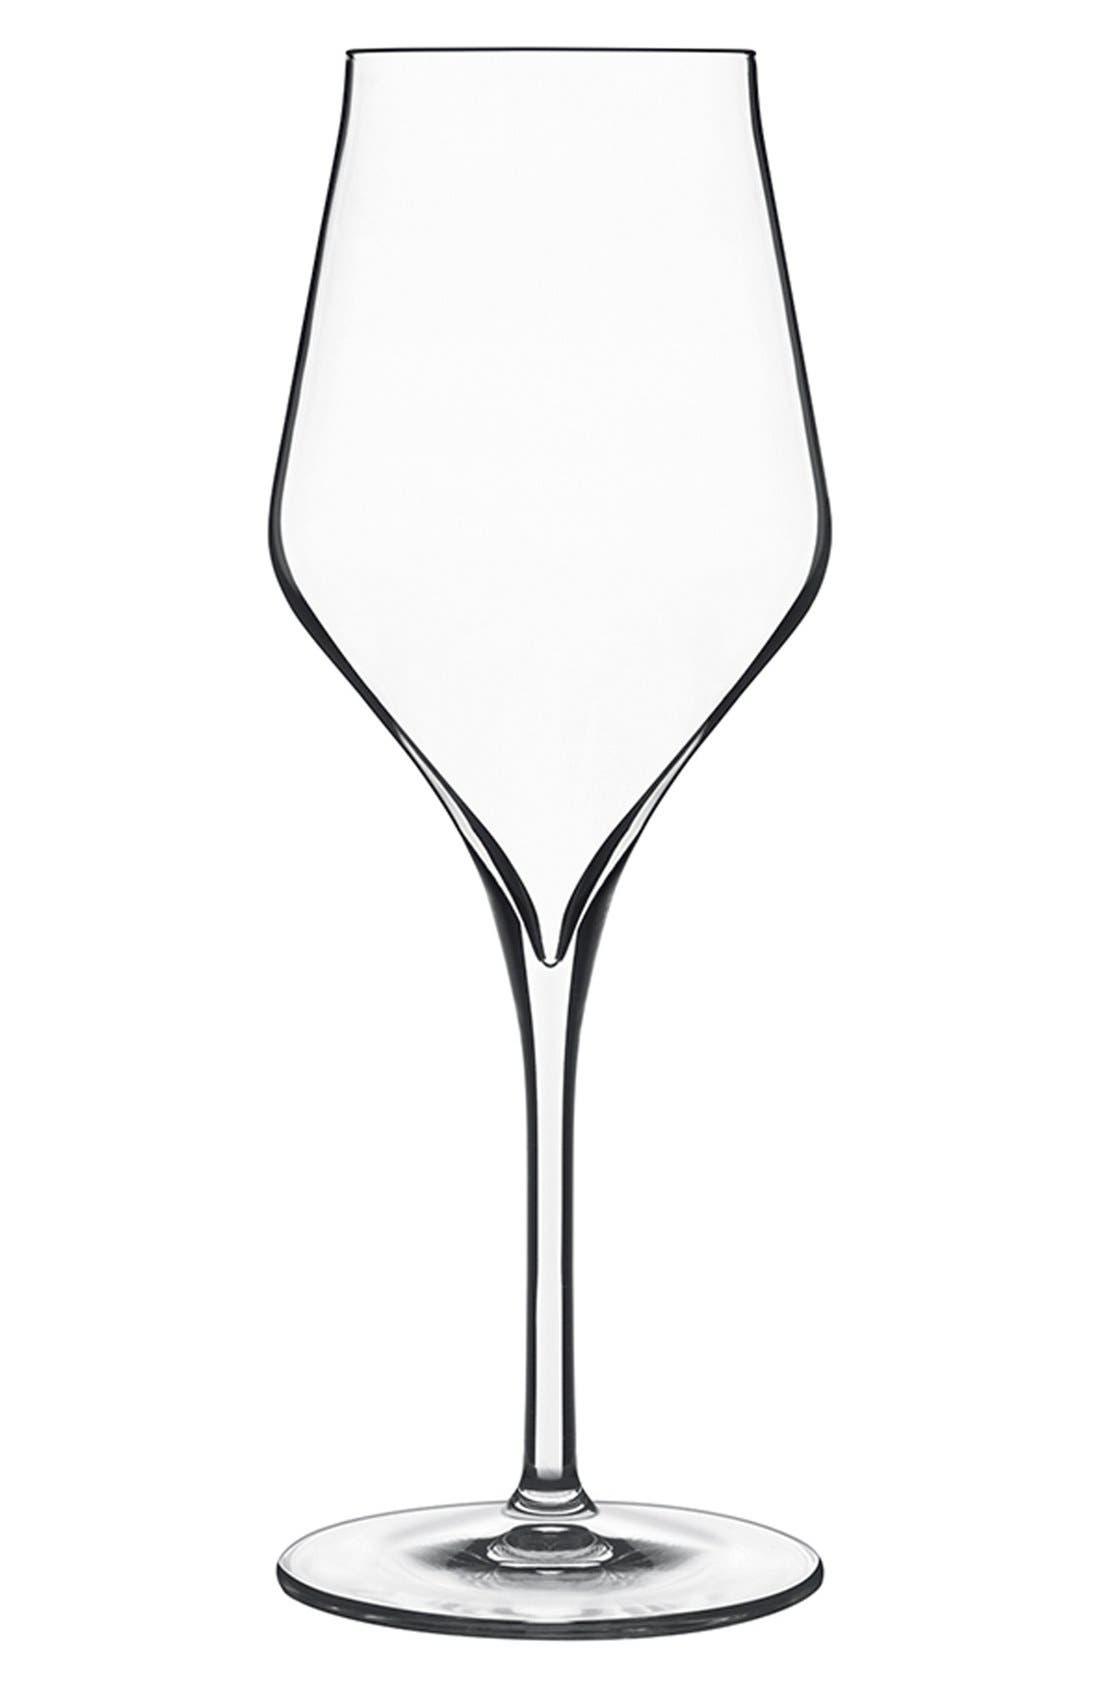 Alternate Image 1 Selected - Luigi Bormioli 'Supremo' Chardonnay Glasses (Set of 6)